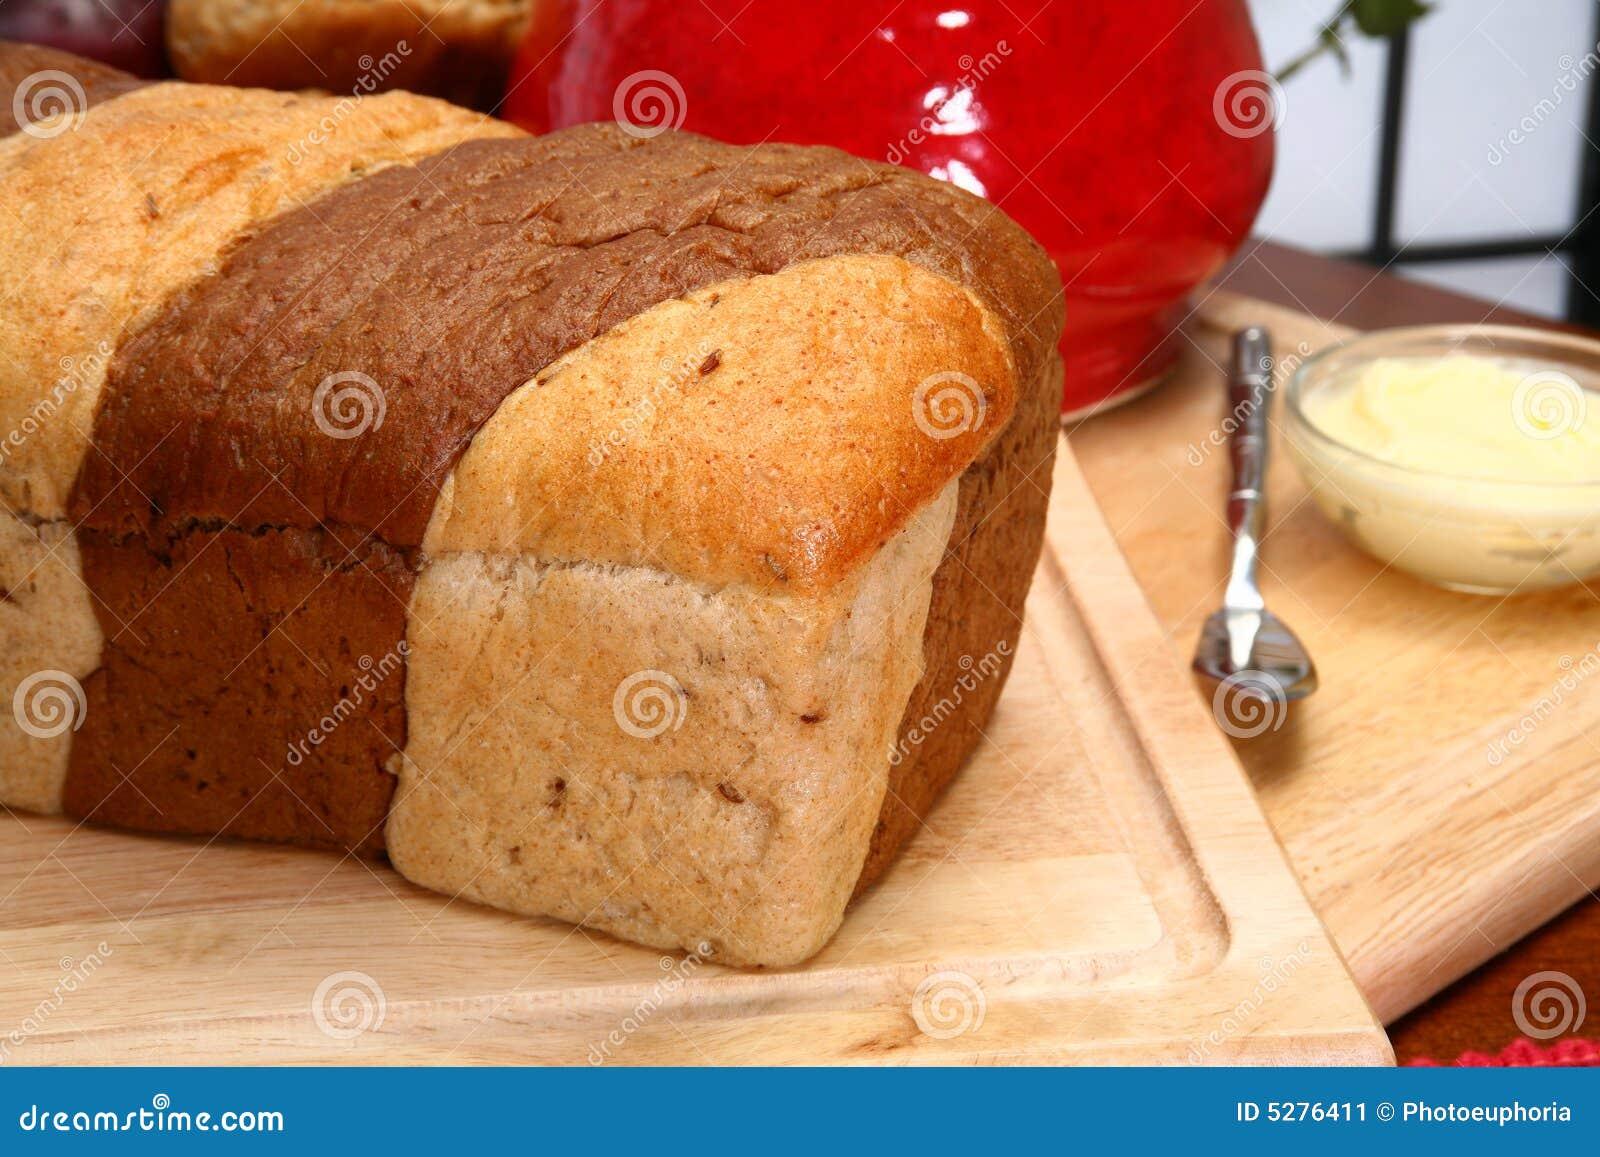 Marble Rye Loaf